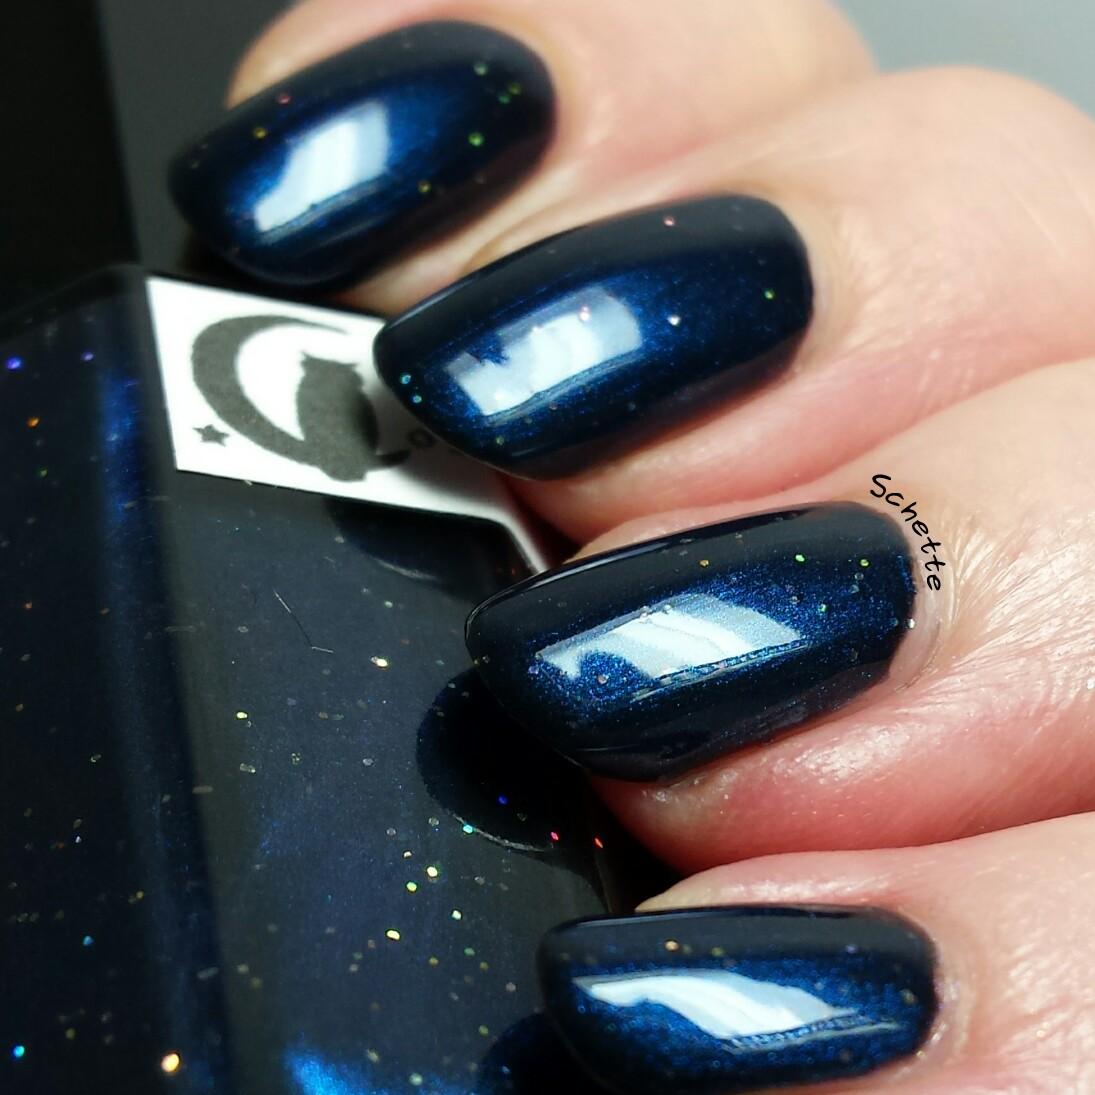 Carpe Noctem Cosmetics : Haileys Comet